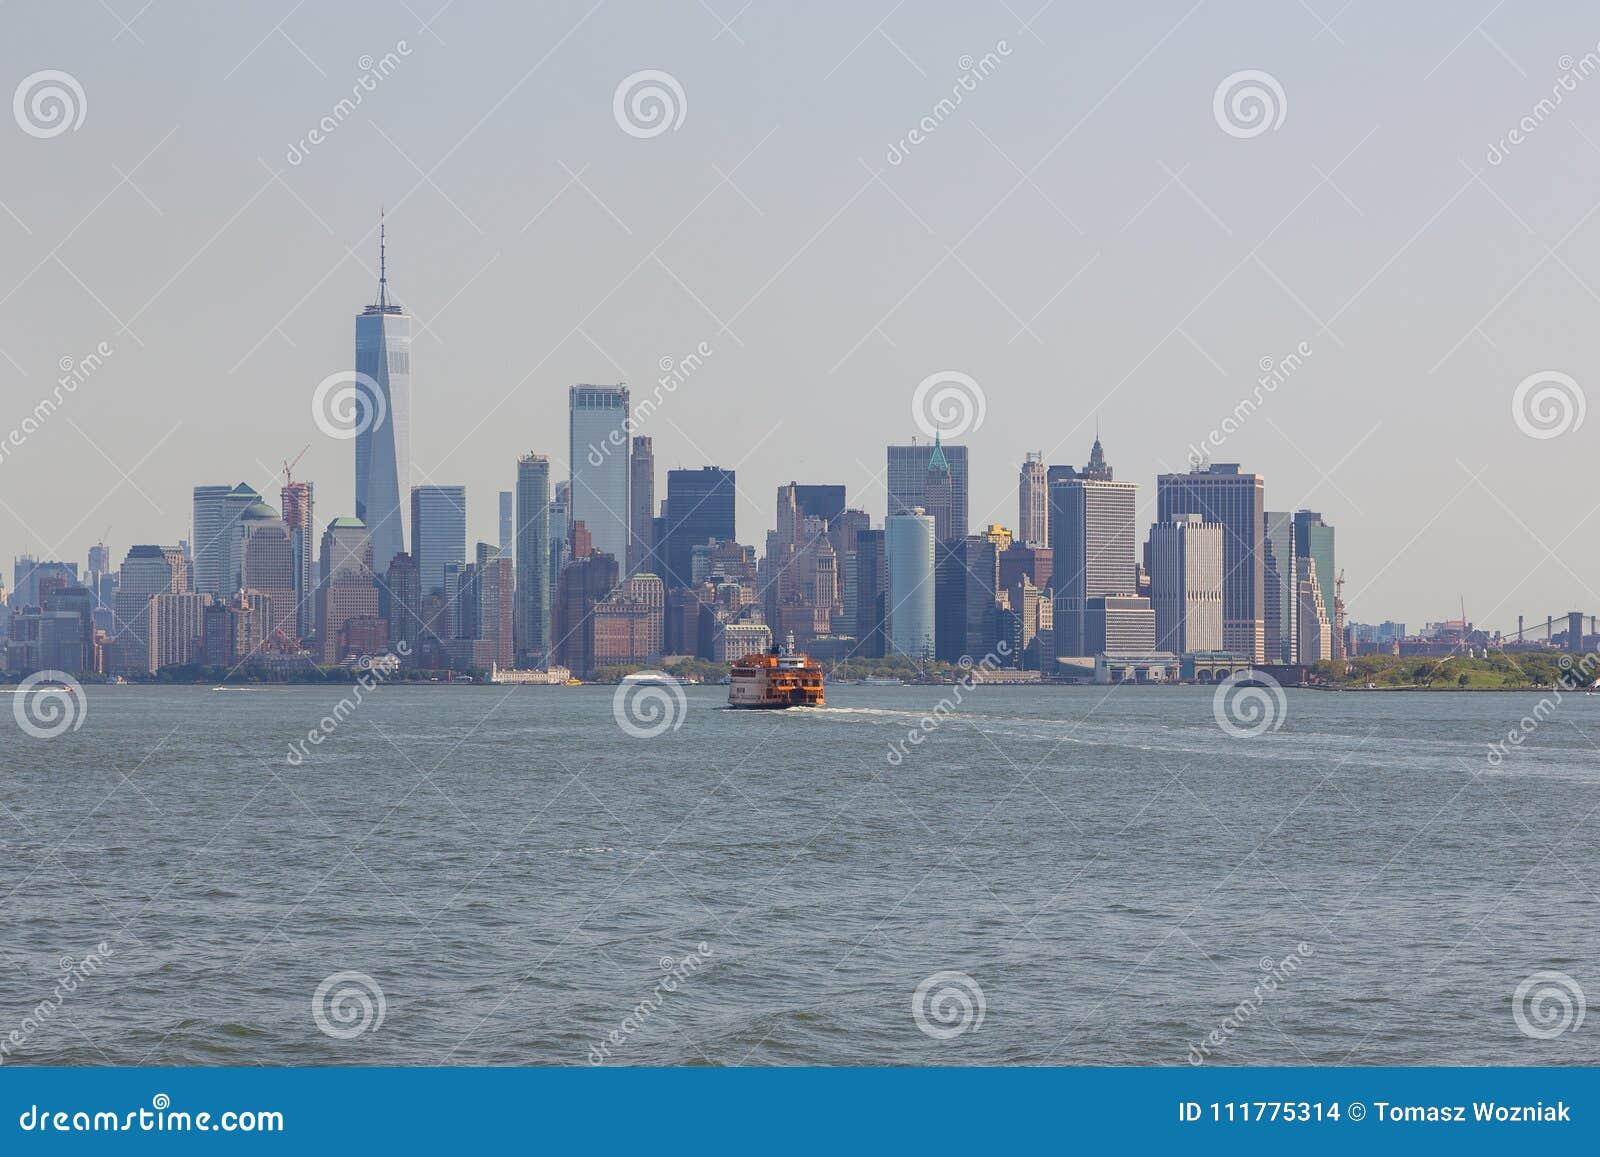 Панорамный взгляд горизонта города Манхаттана, Нью-Йорка